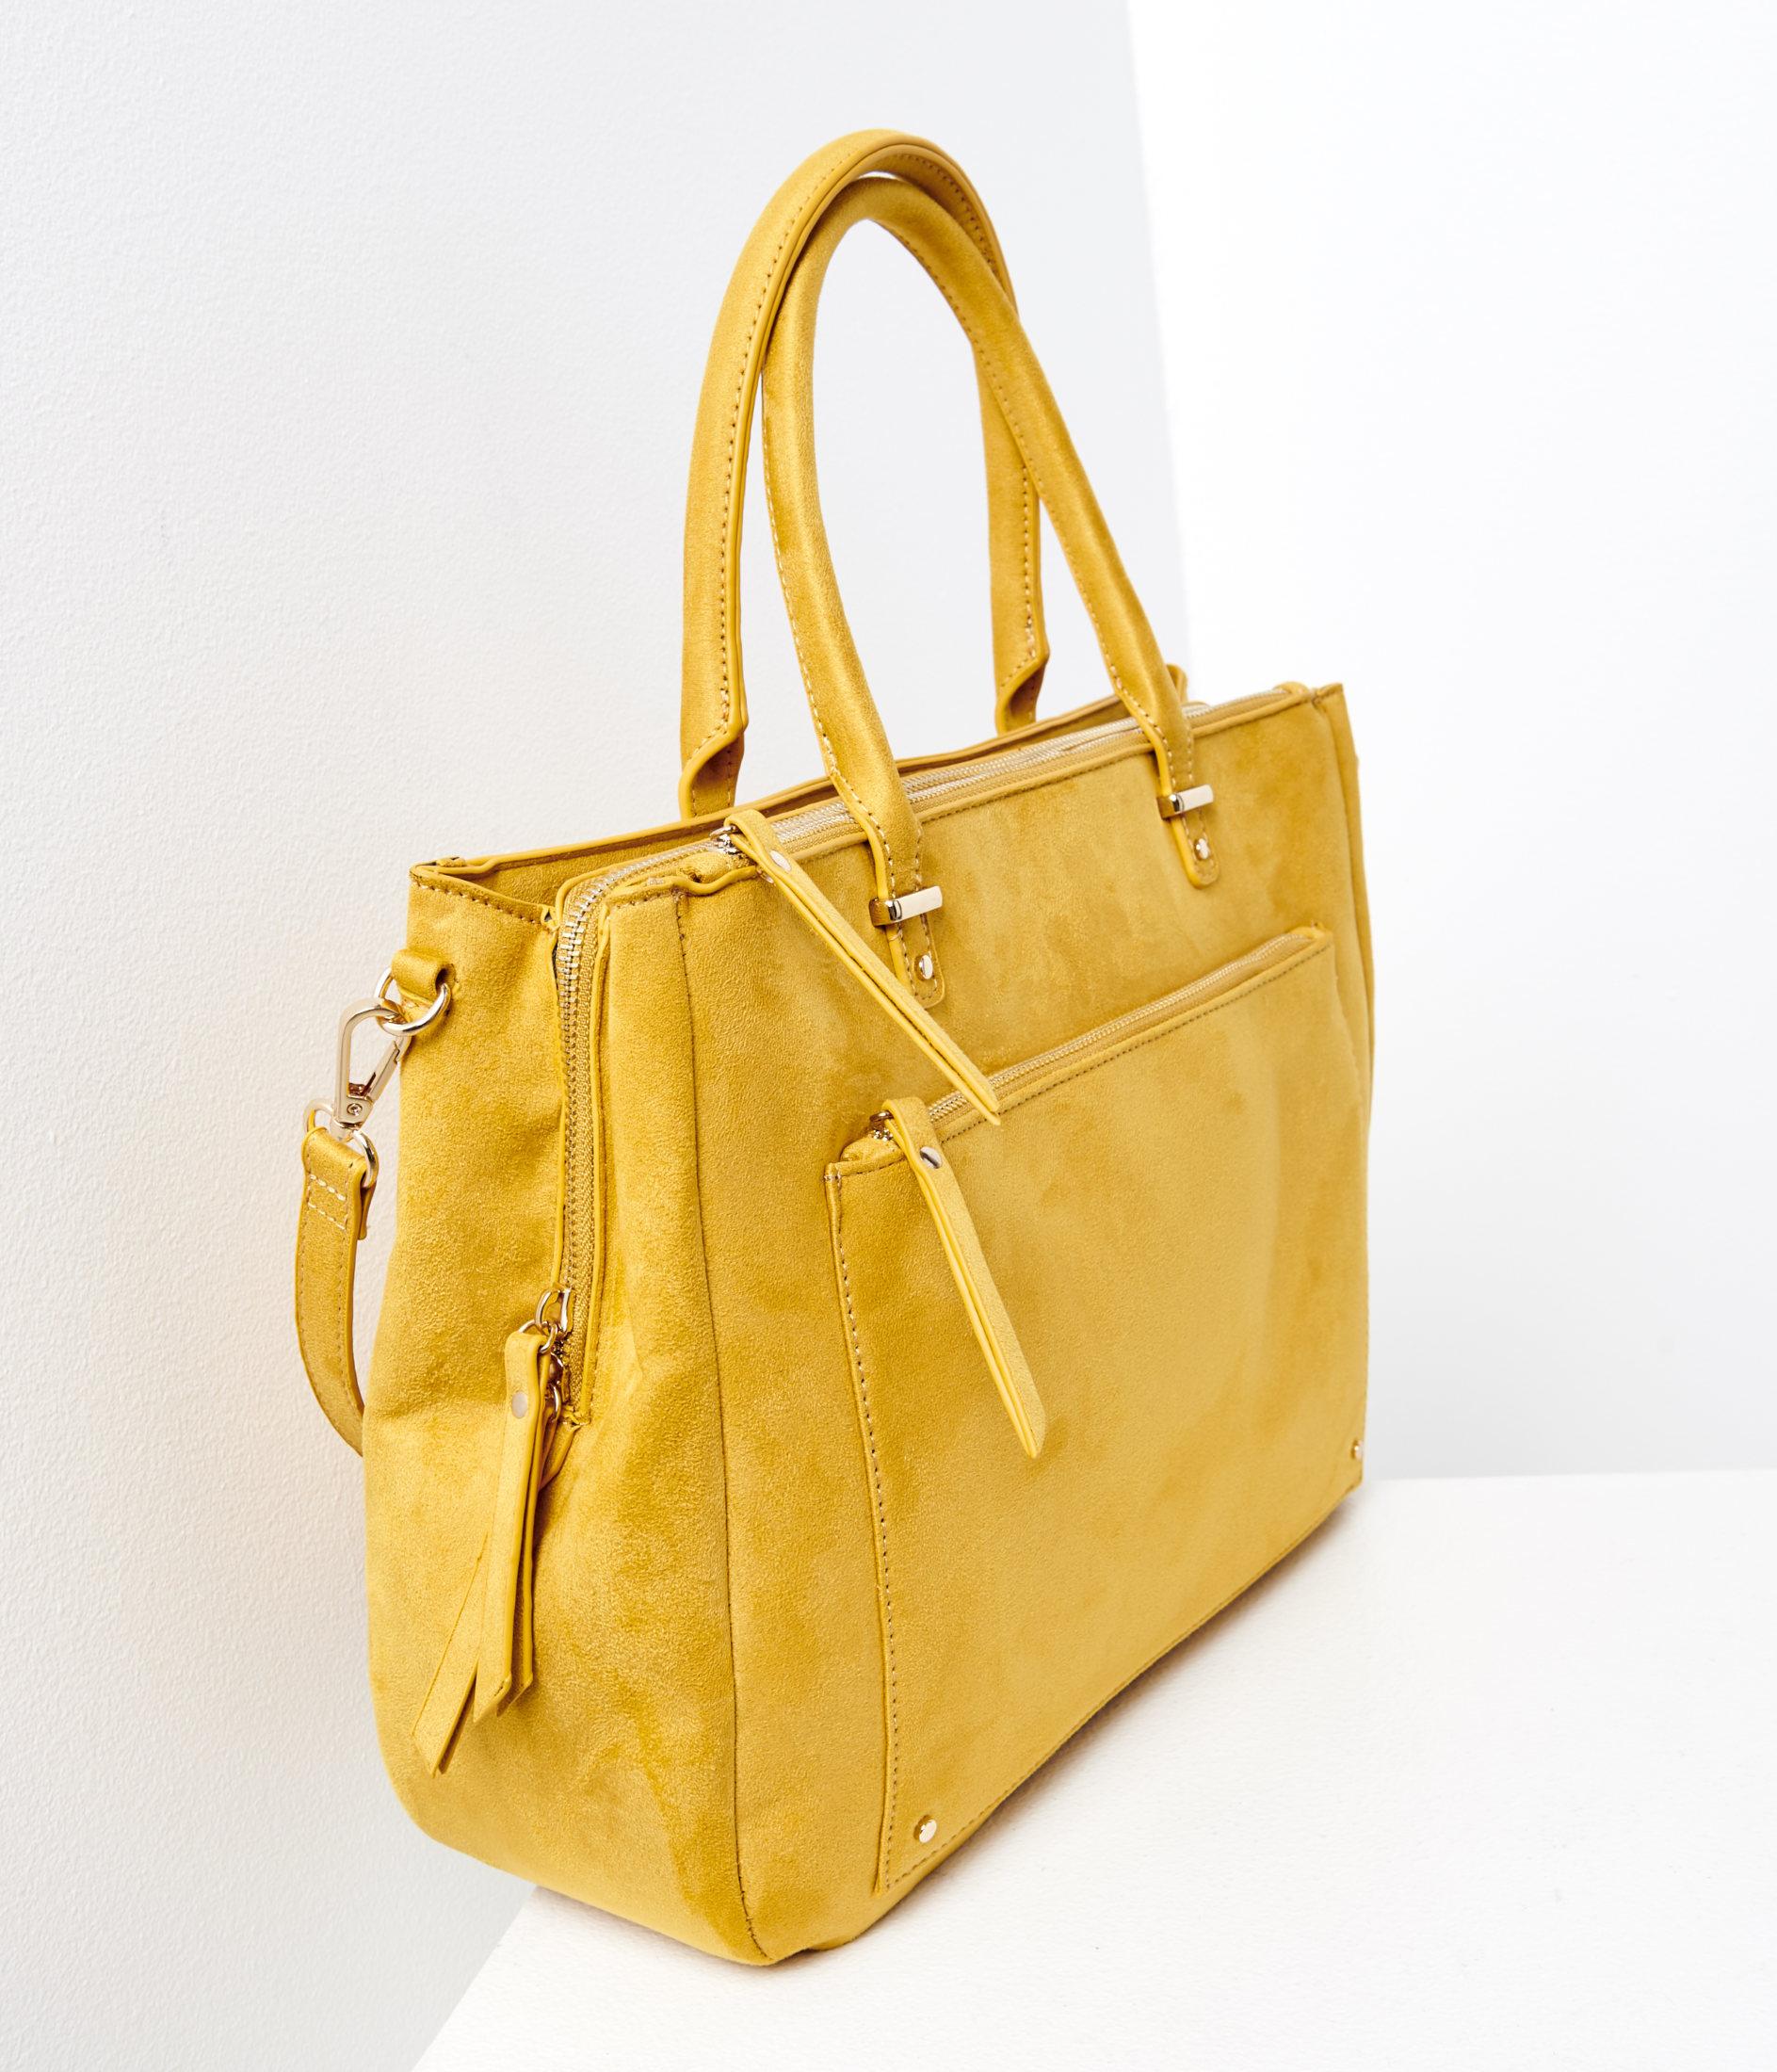 CAMAIEU Ženske torbice rumena